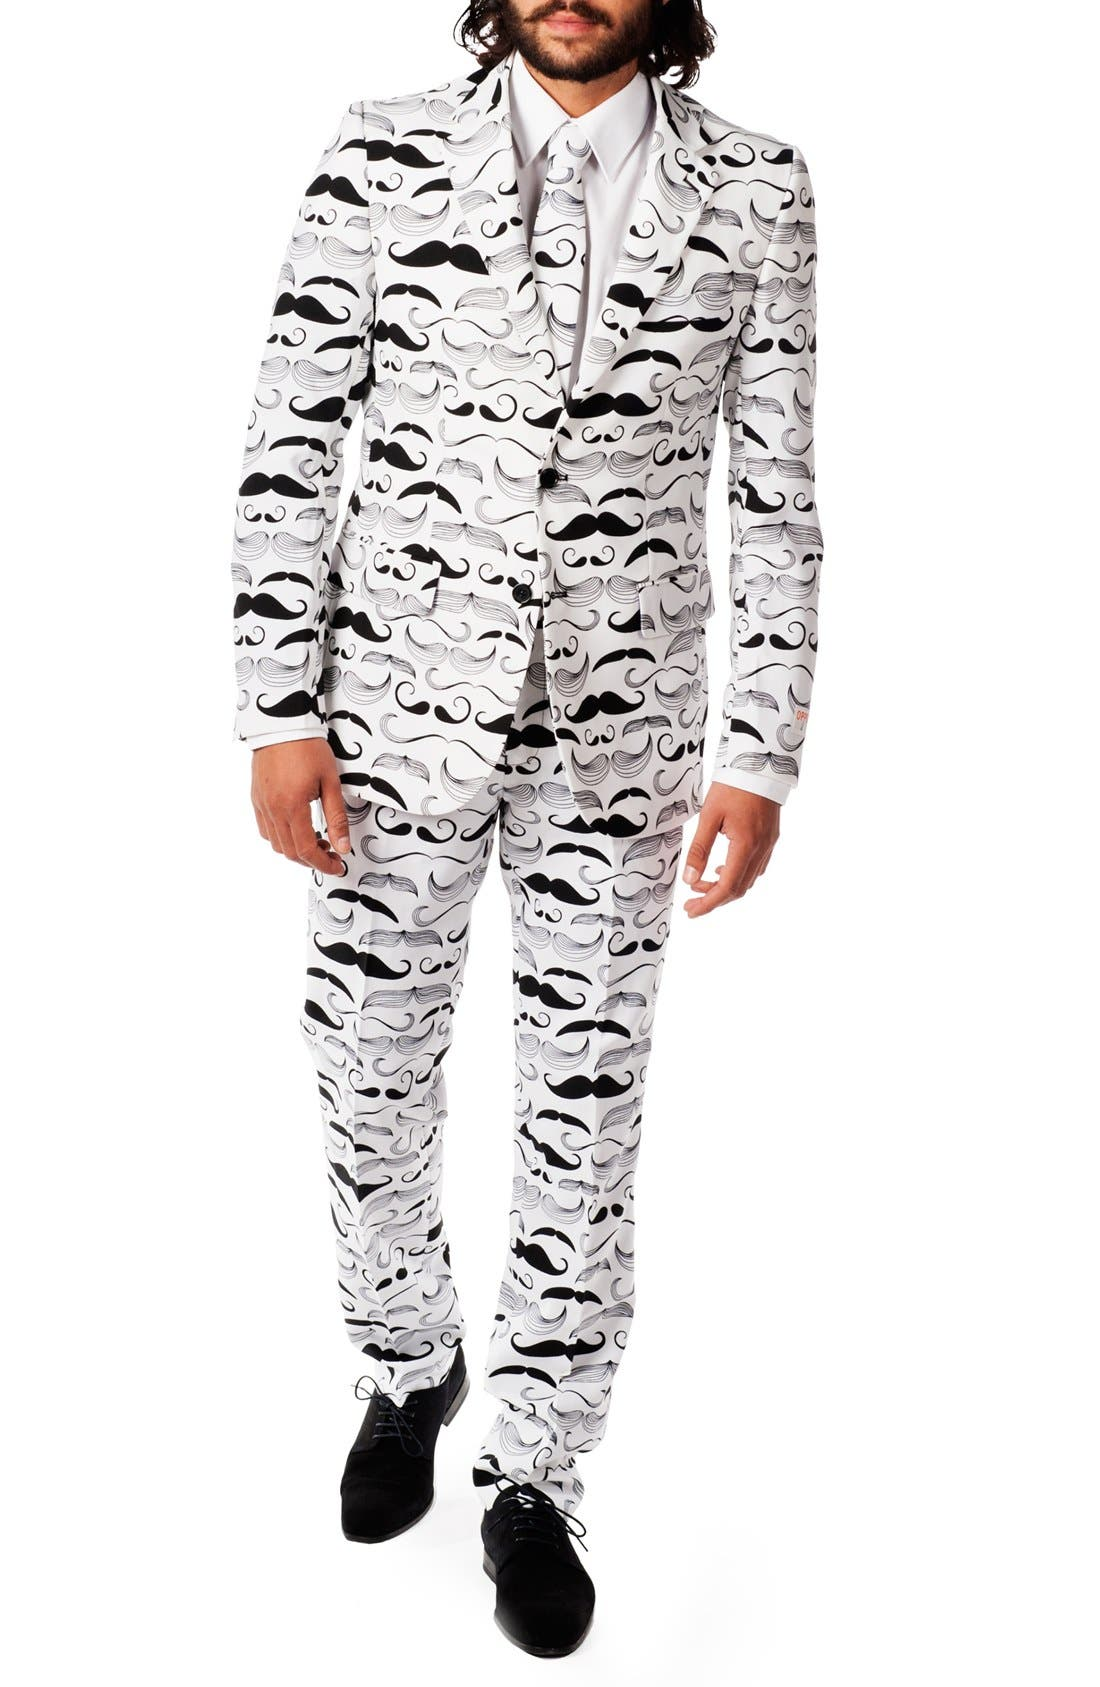 OppoSuits 'Tashtastic' Trim Fit Two-Piece Suit with Tie